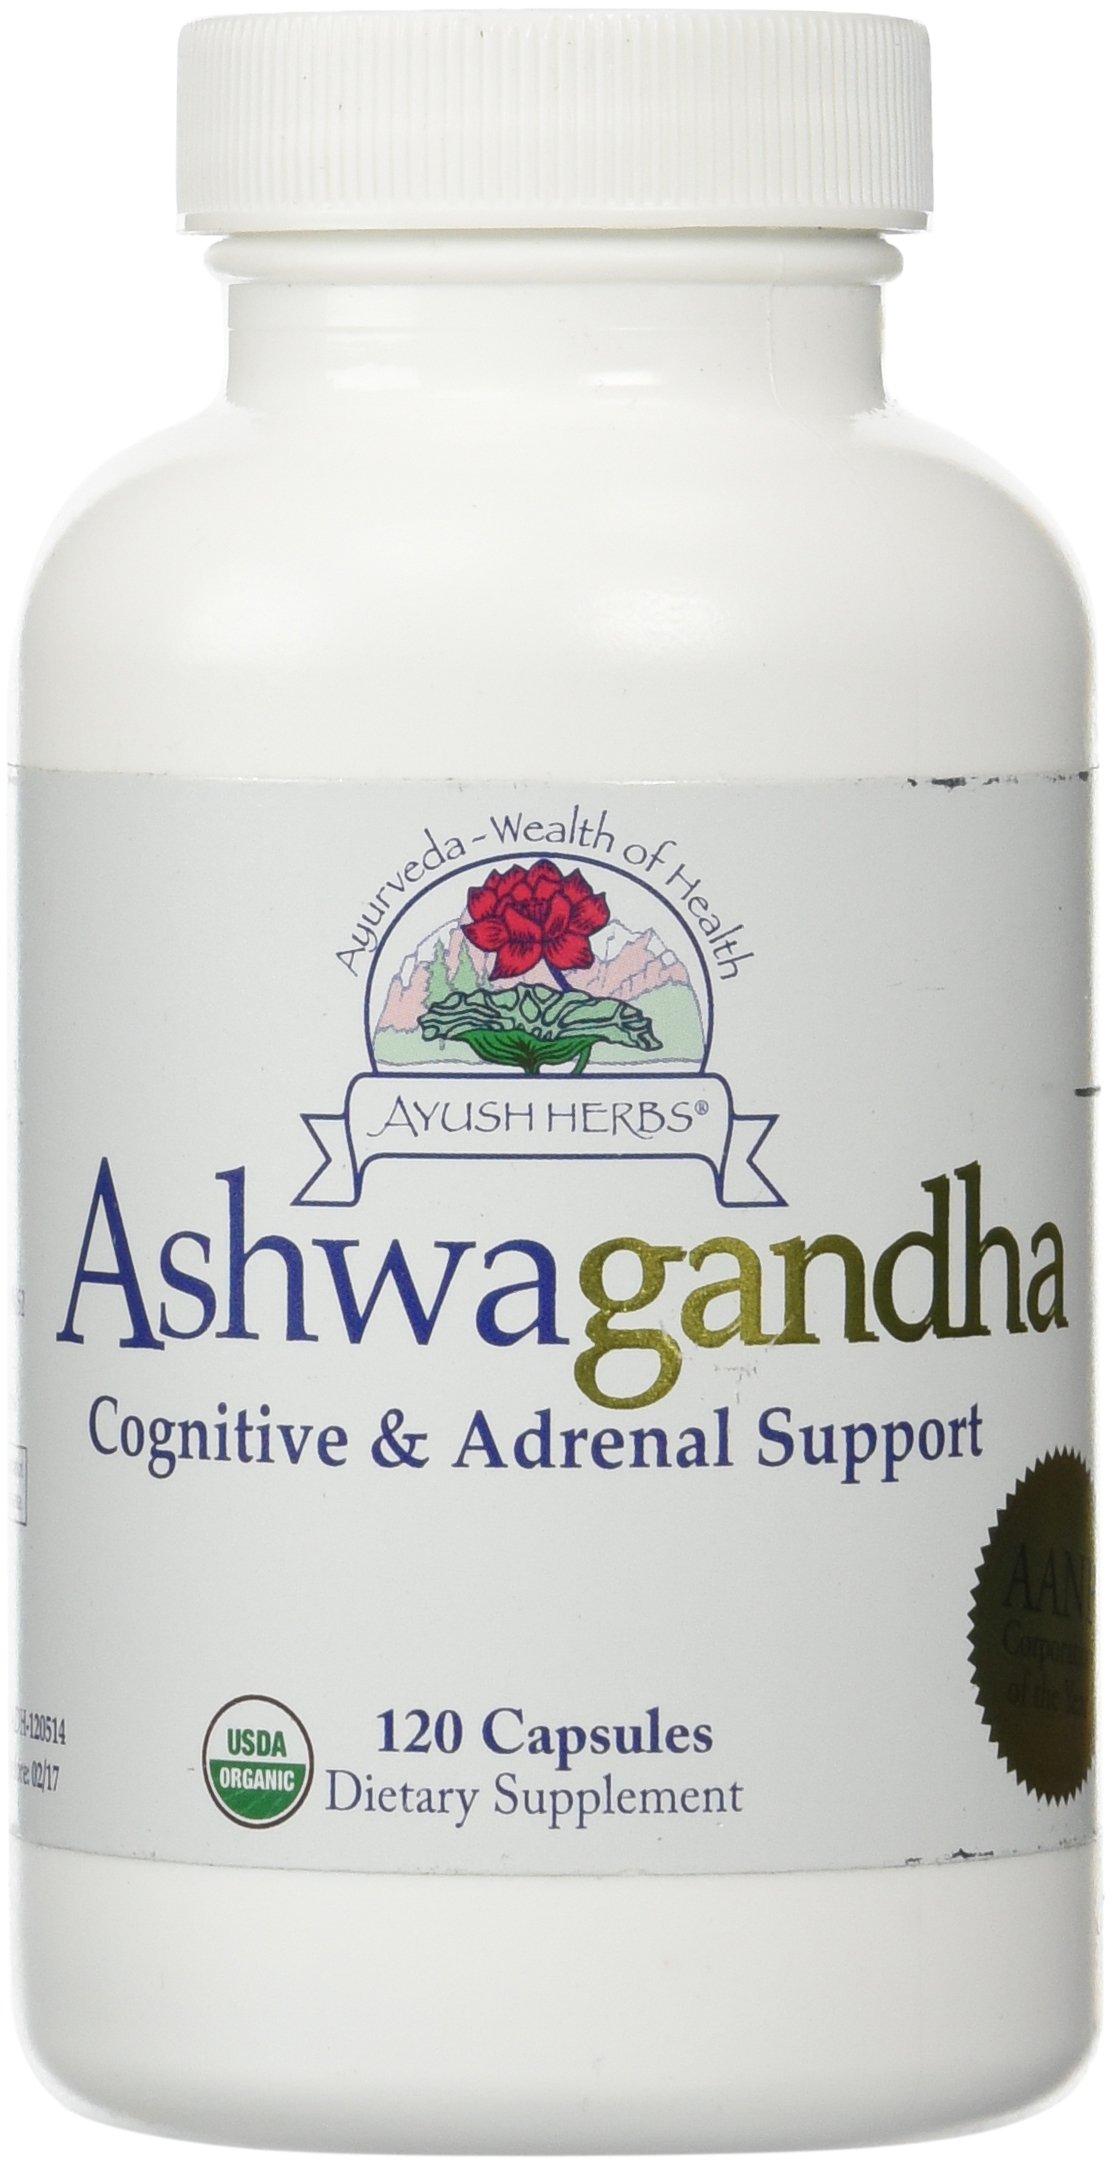 Ayush Herbs - Ashwagandha 120 Veggie Capsules